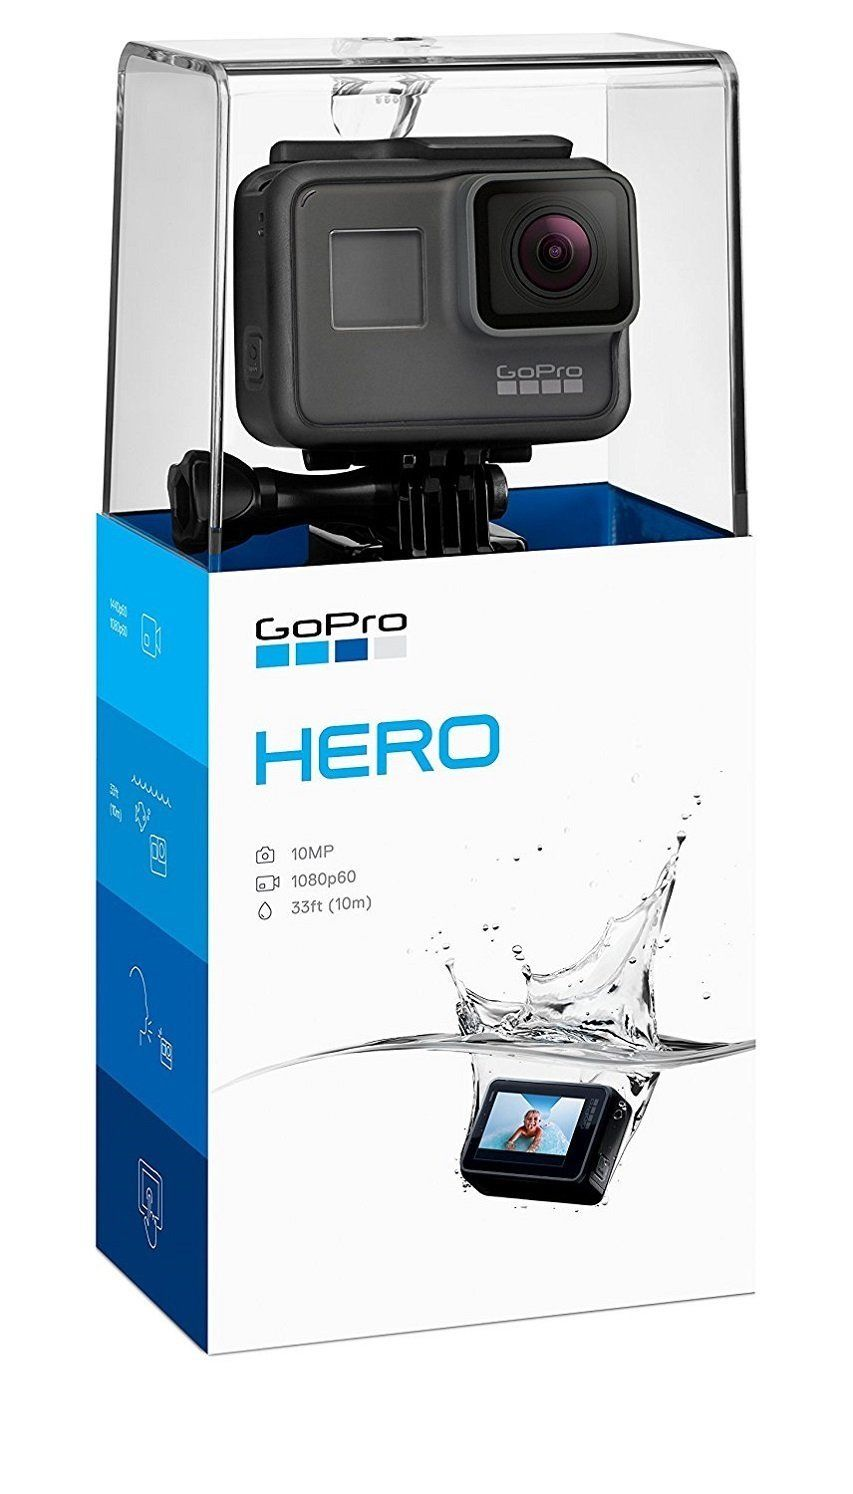 depart Skilled Hero (18) Movement Electronic digital camera Black